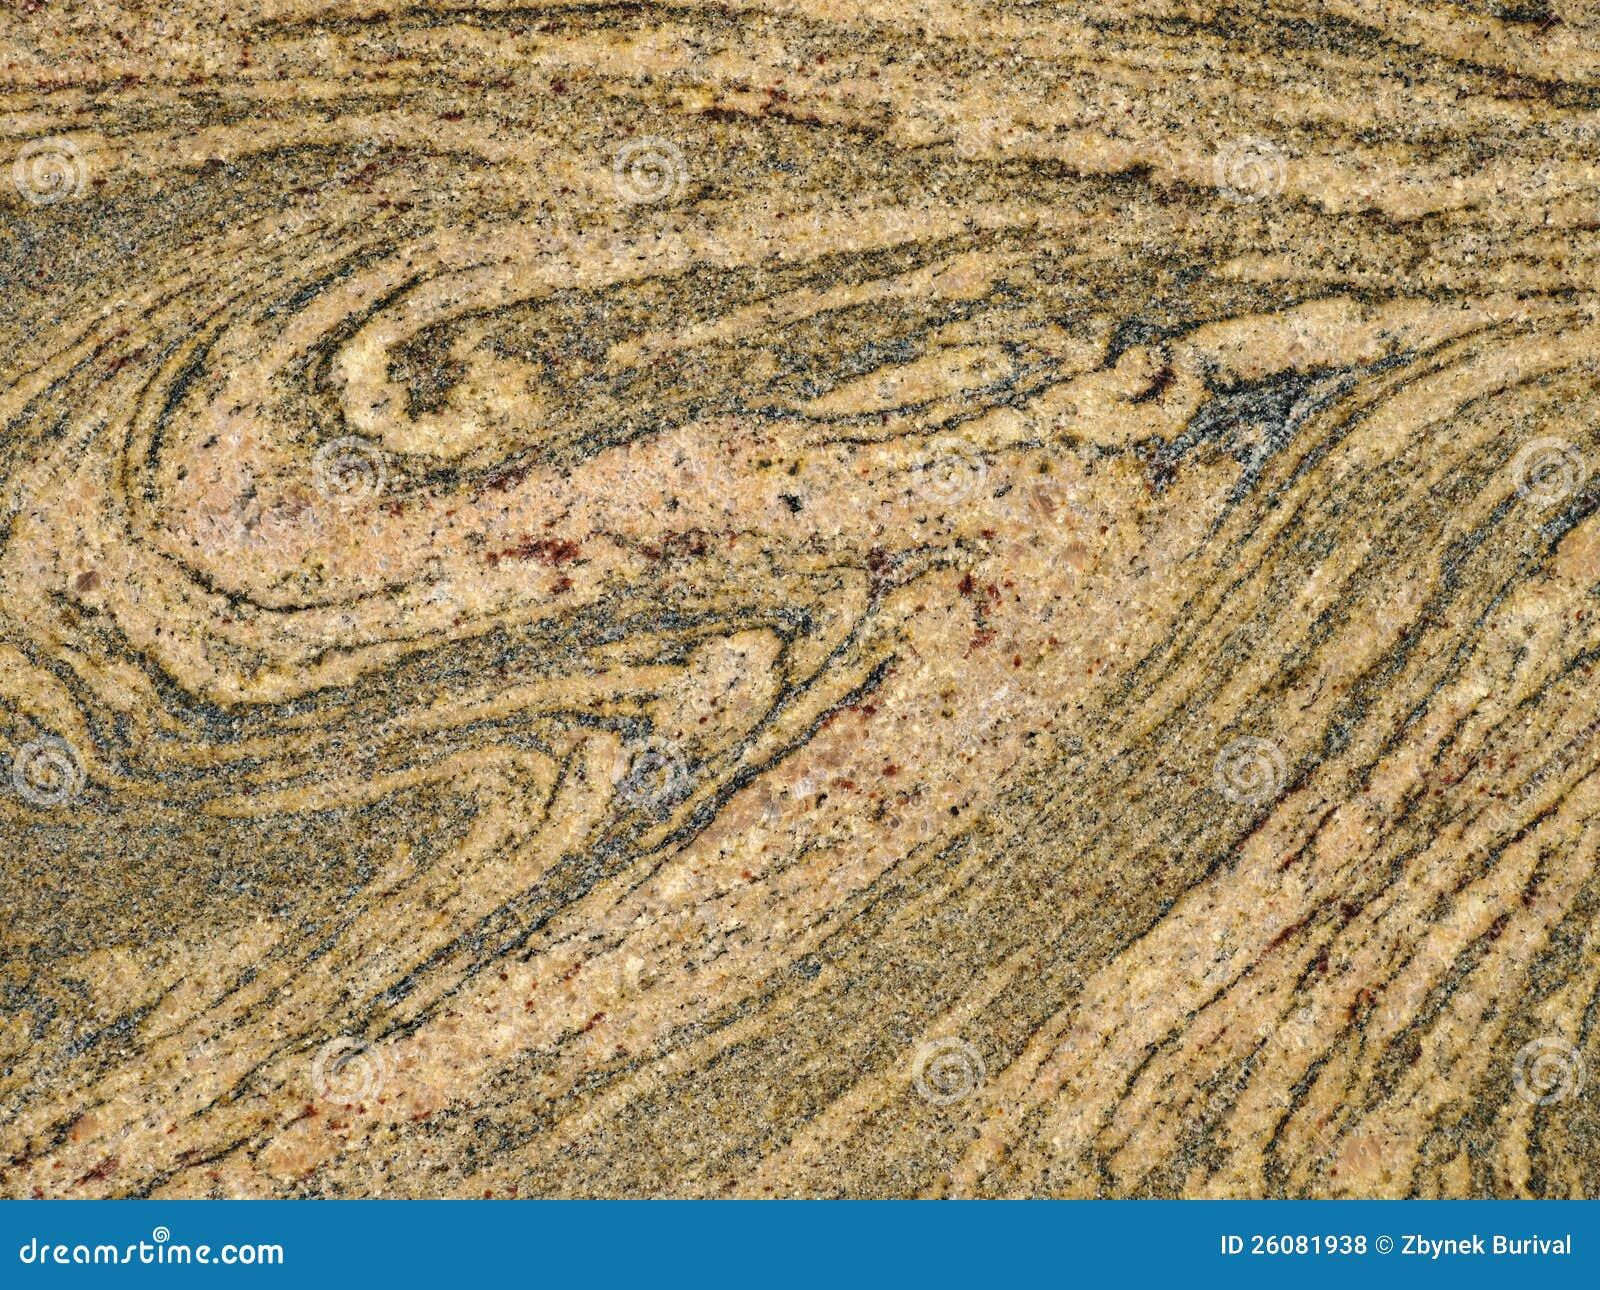 Rough Migmatite Rock Texture Royalty Free Stock Photos ...